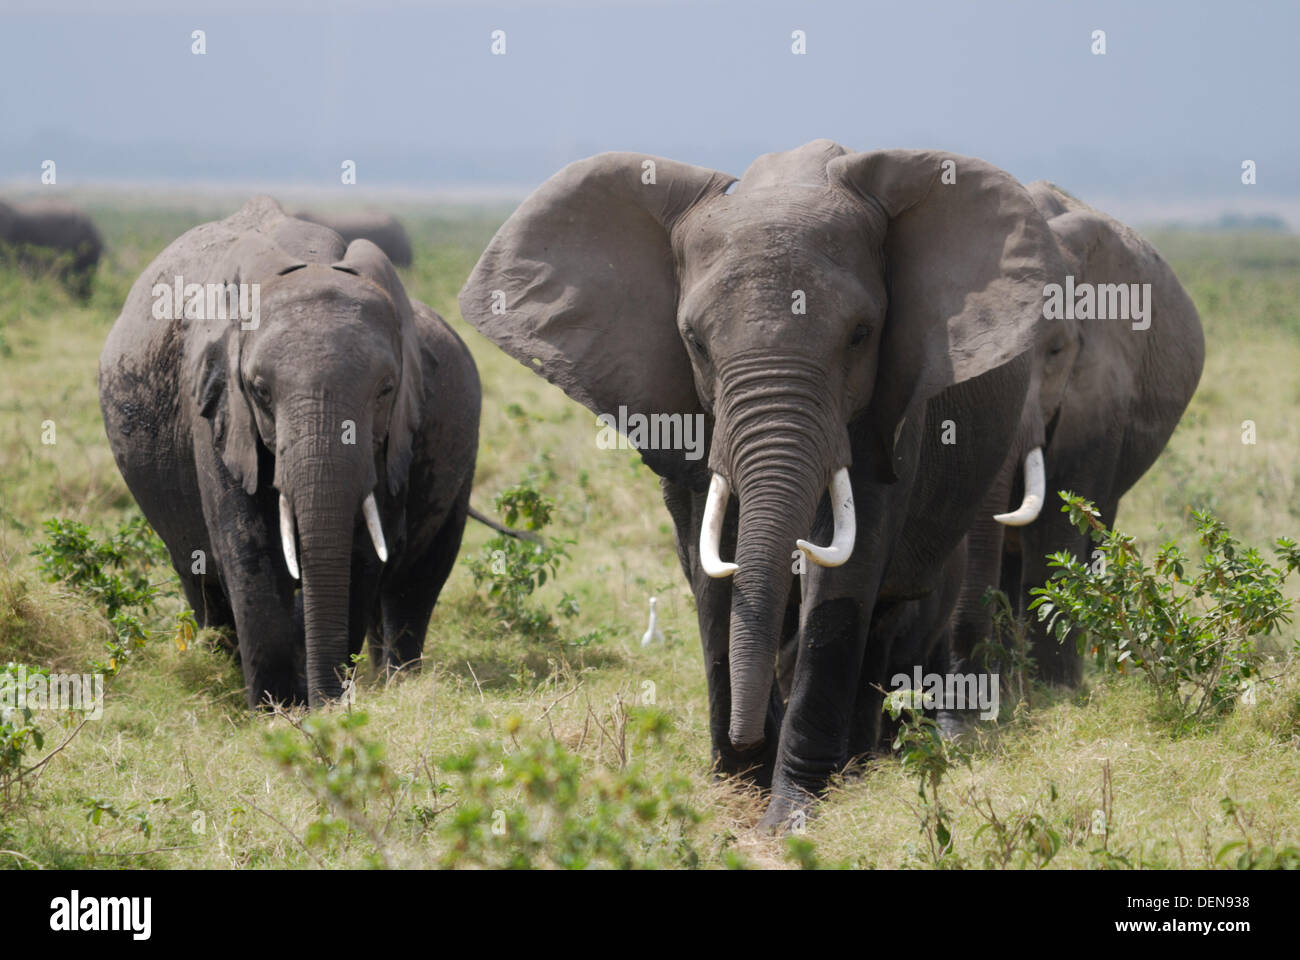 Herd of African Bush Elephant or African Savanna Elephant (Loxodonta africana). Amboseli National Park. Kenya. Africa - Stock Image